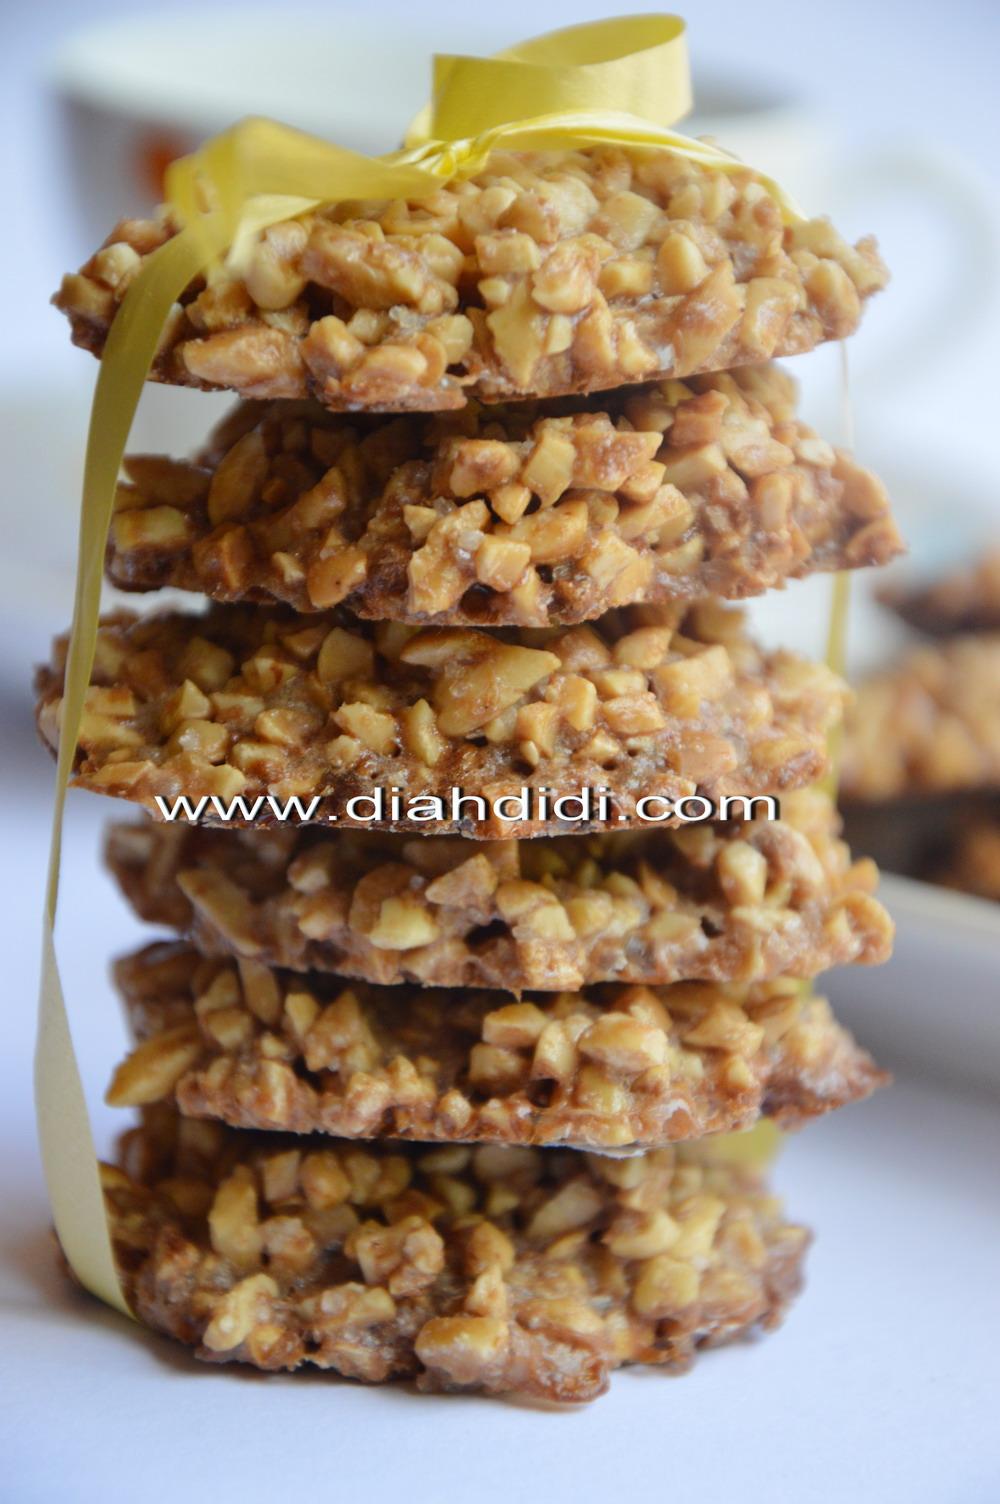 Diah Didis Kitchen Kue Kering Ampyang Kacang Coklat